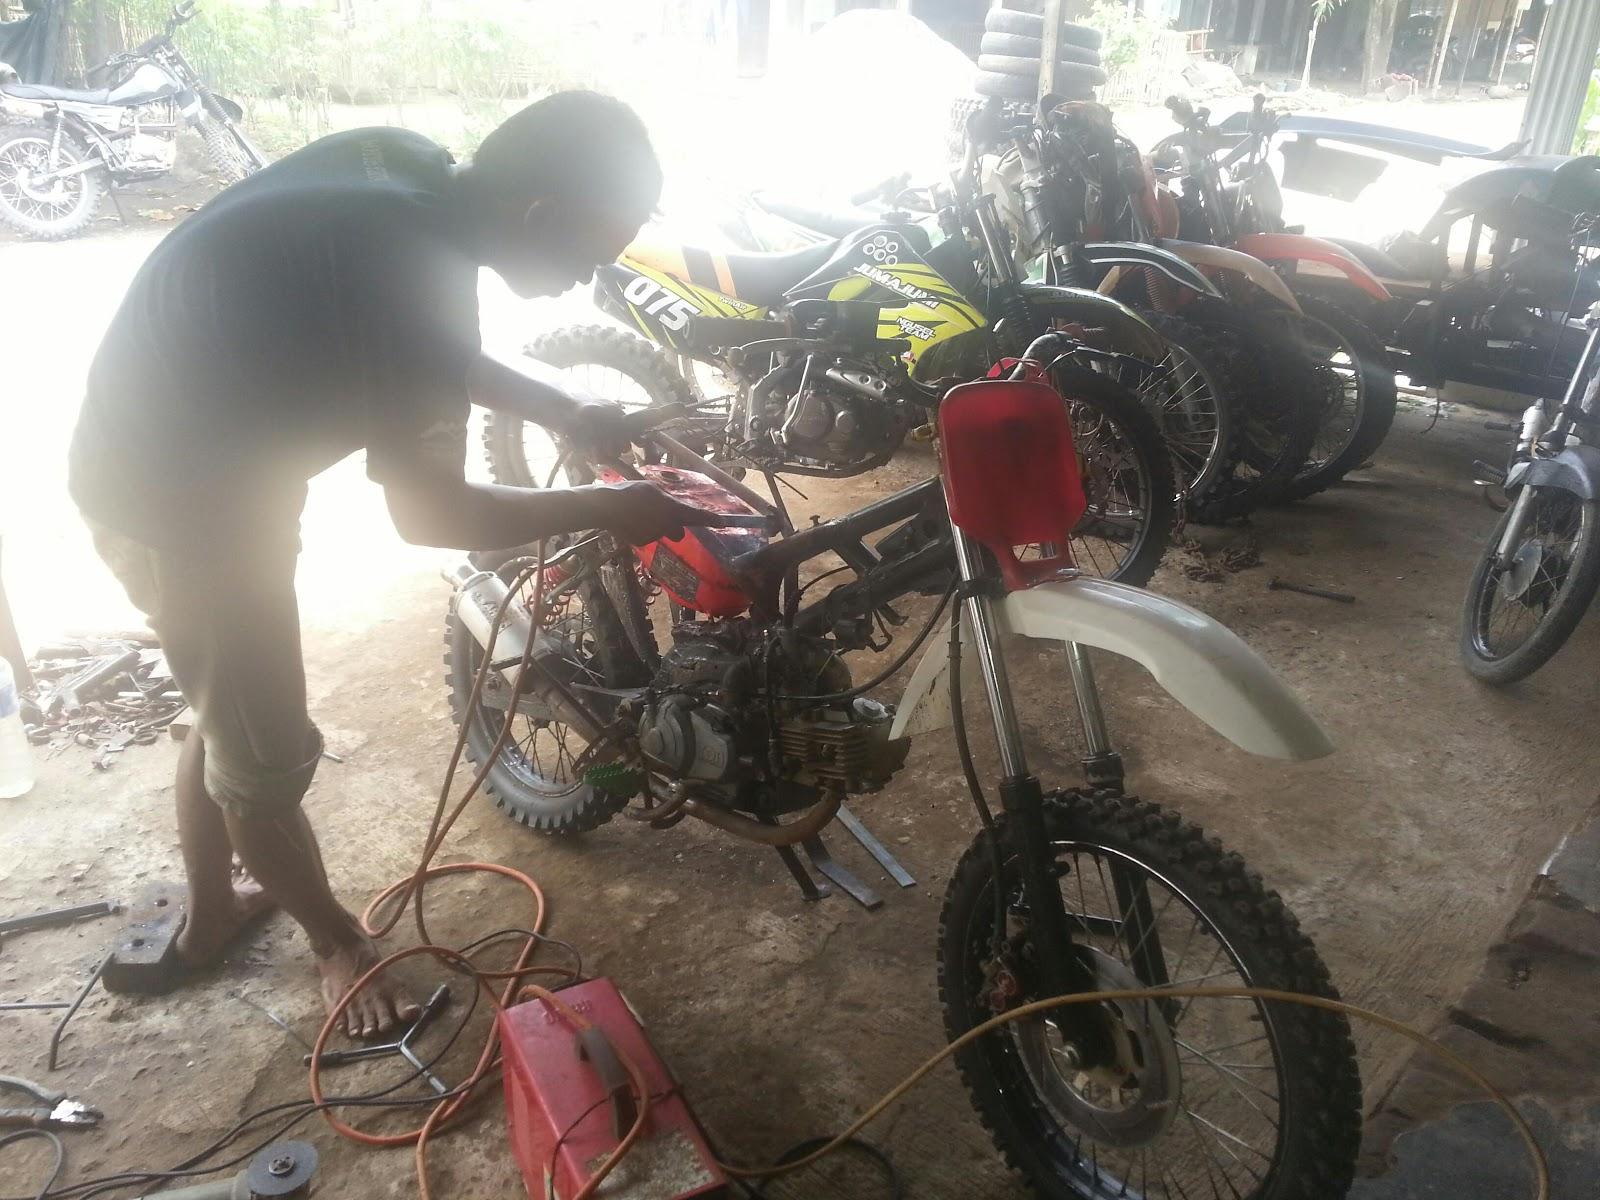 OTO MANIA Bengkel Modif Motor Trail Jais Nguren Ramai Pesanan